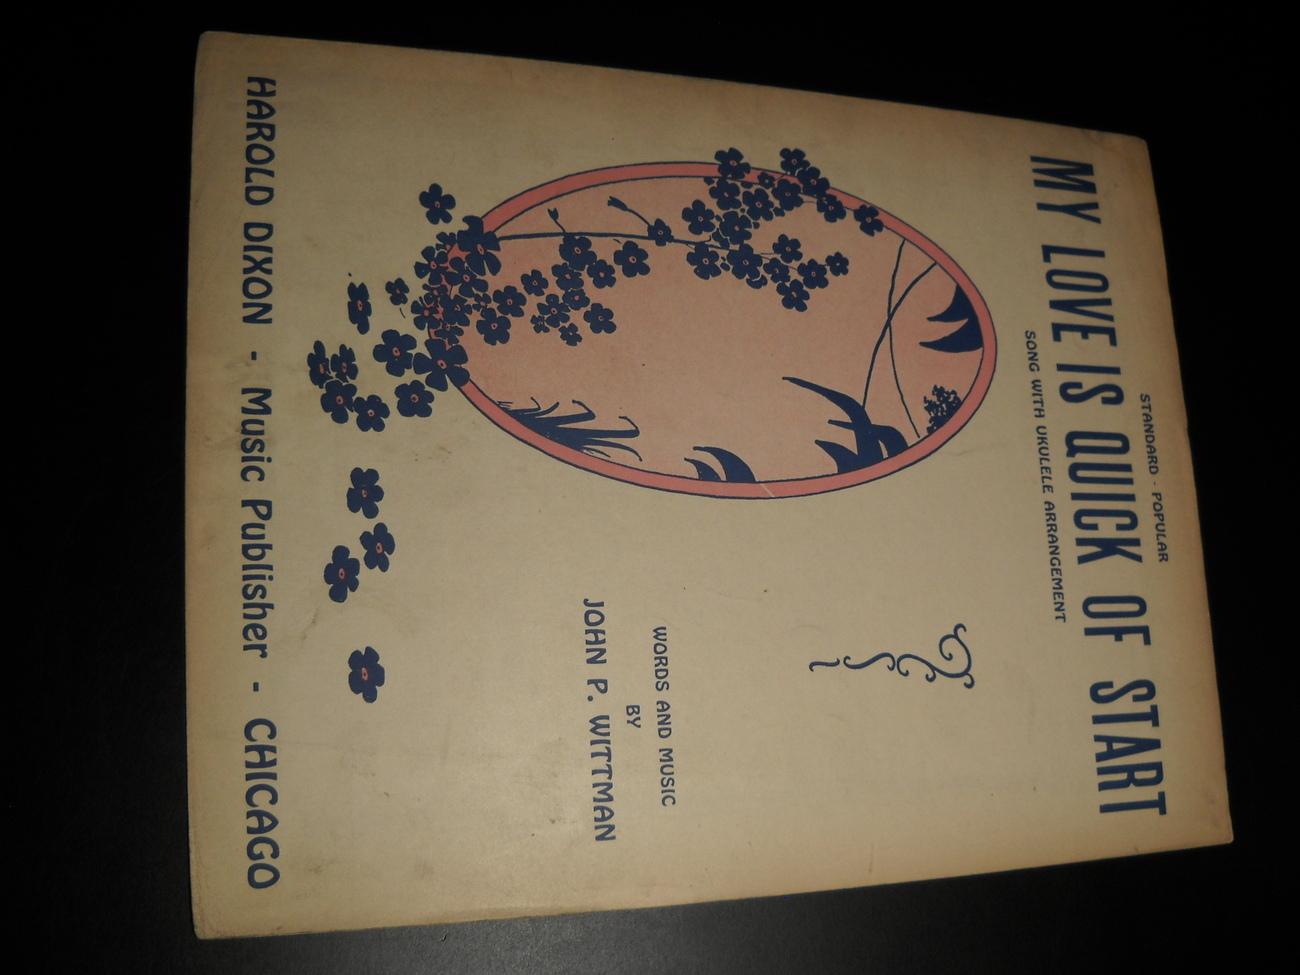 Sheet_music_my_love_is_quick_of_start_john_p_whitman_1931_harold_dixon_01